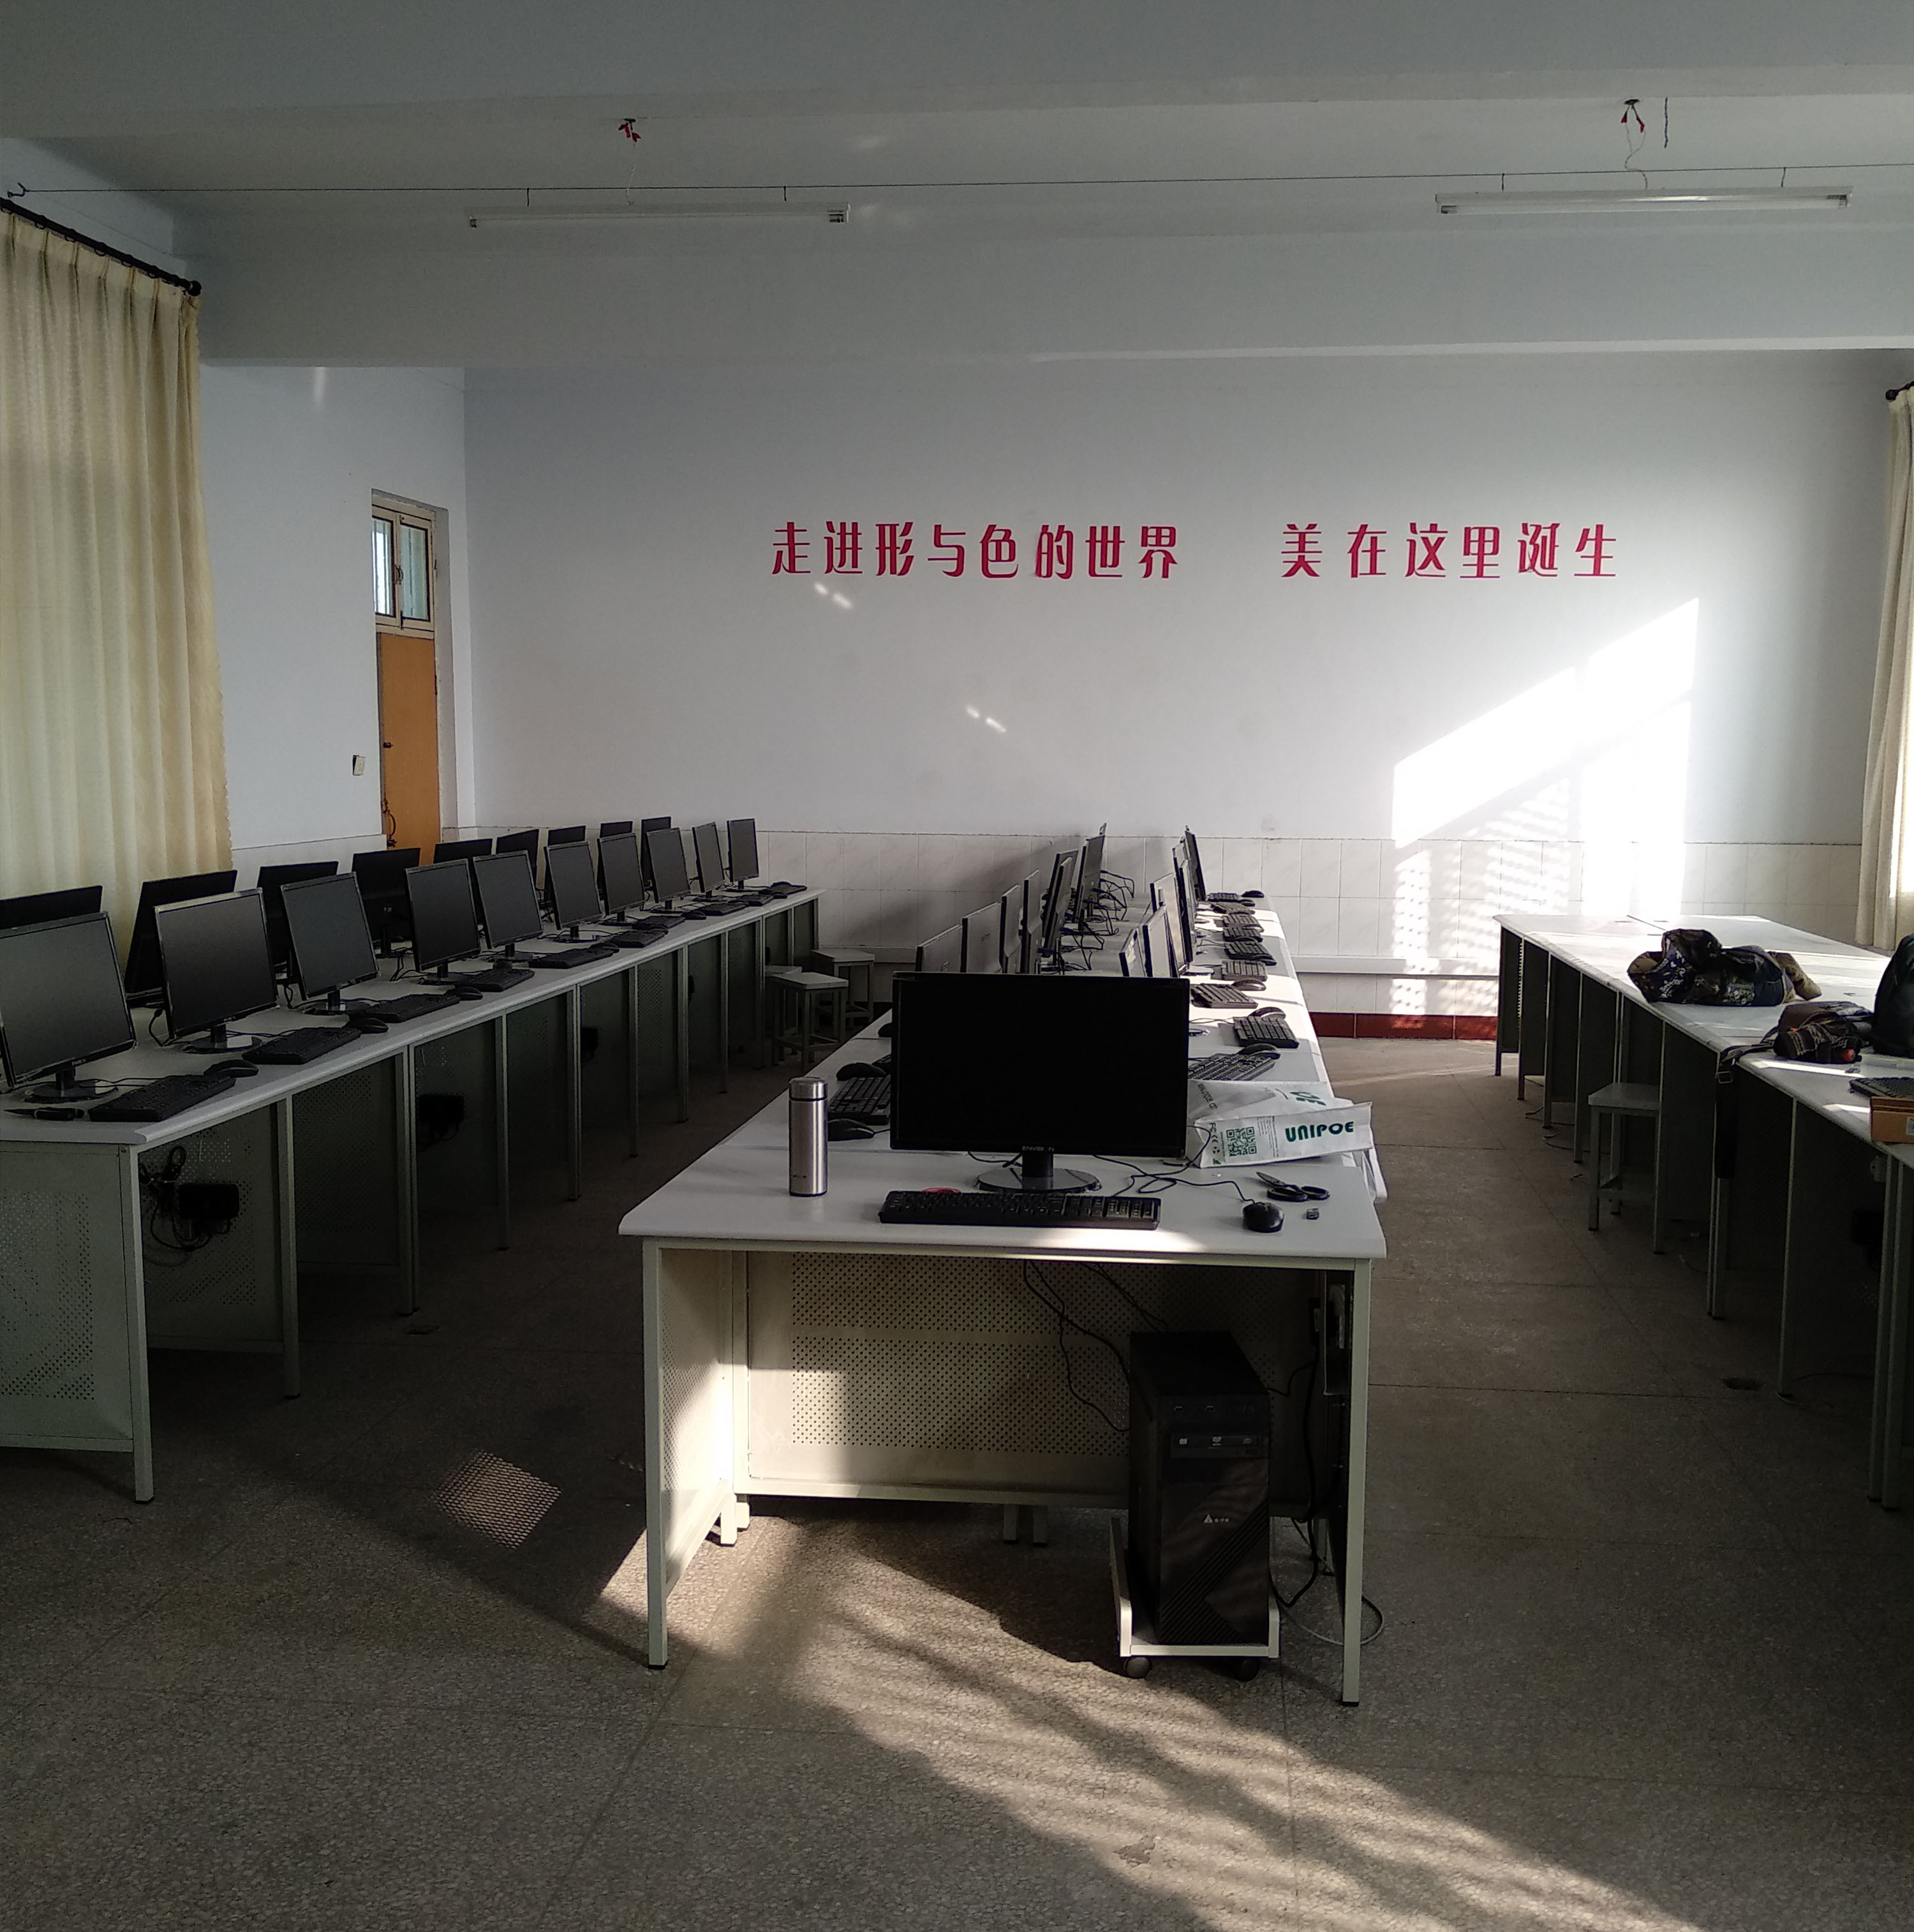 Xiangyang-Mifei-Middle-School-In-China2